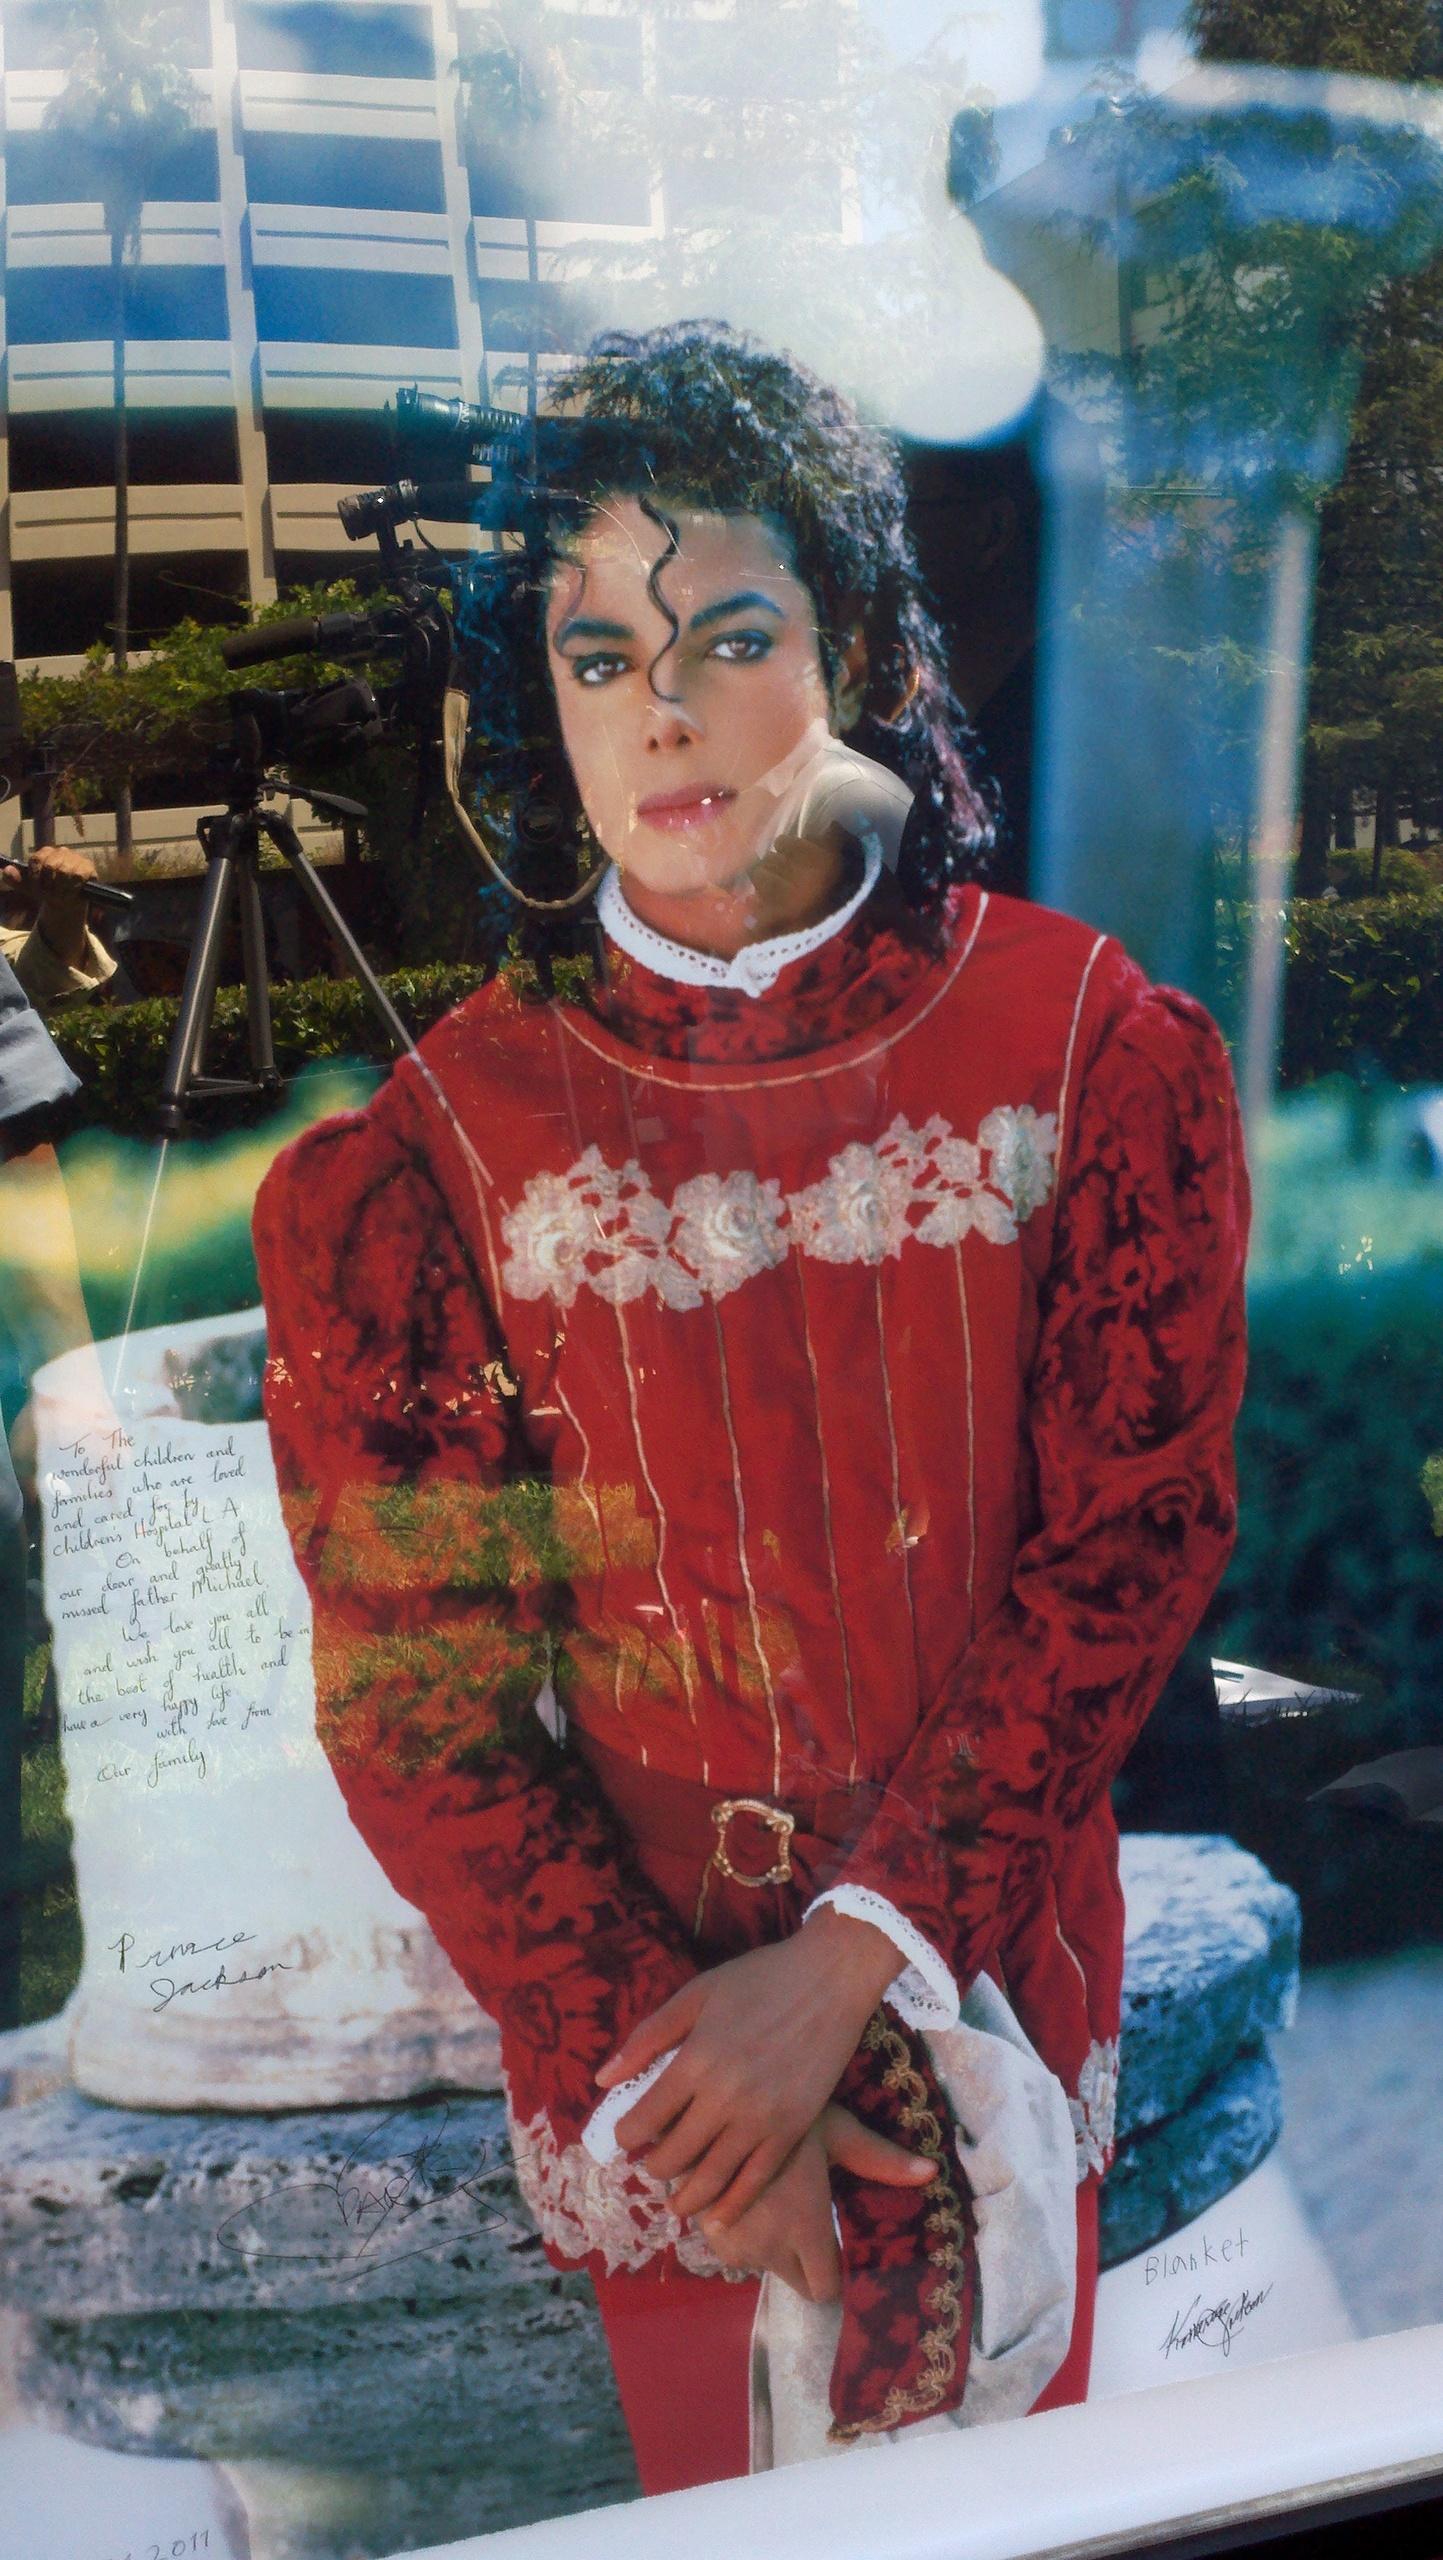 Michael Jackson's kids donate late star's art to children's hospital